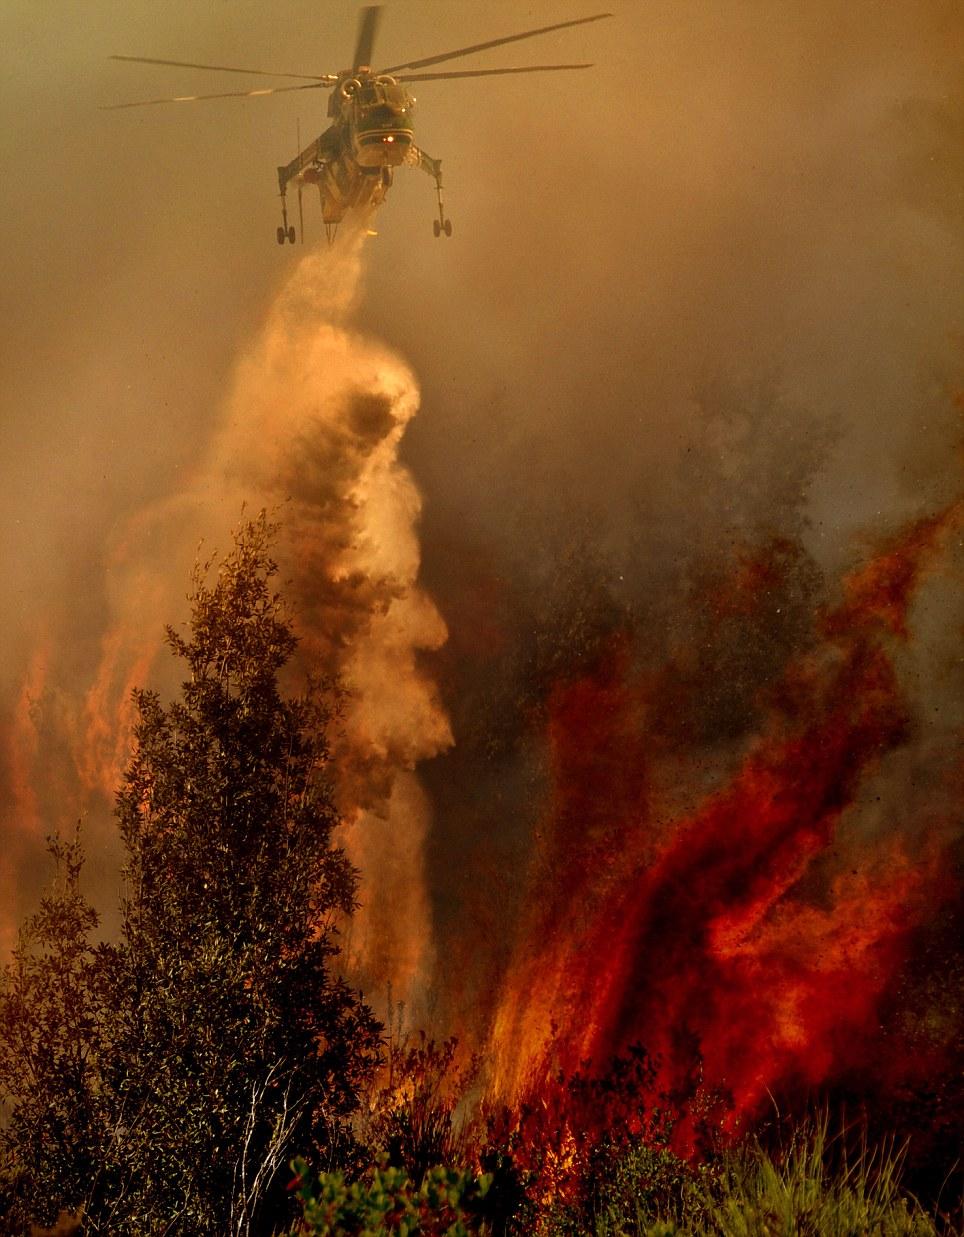 aeronaves - [Brasil] Fotos incríveis de aeronaves no combate aos incêndios florestais na Itália  Article-2335103-1A1F0925000005DC-998_964x1237